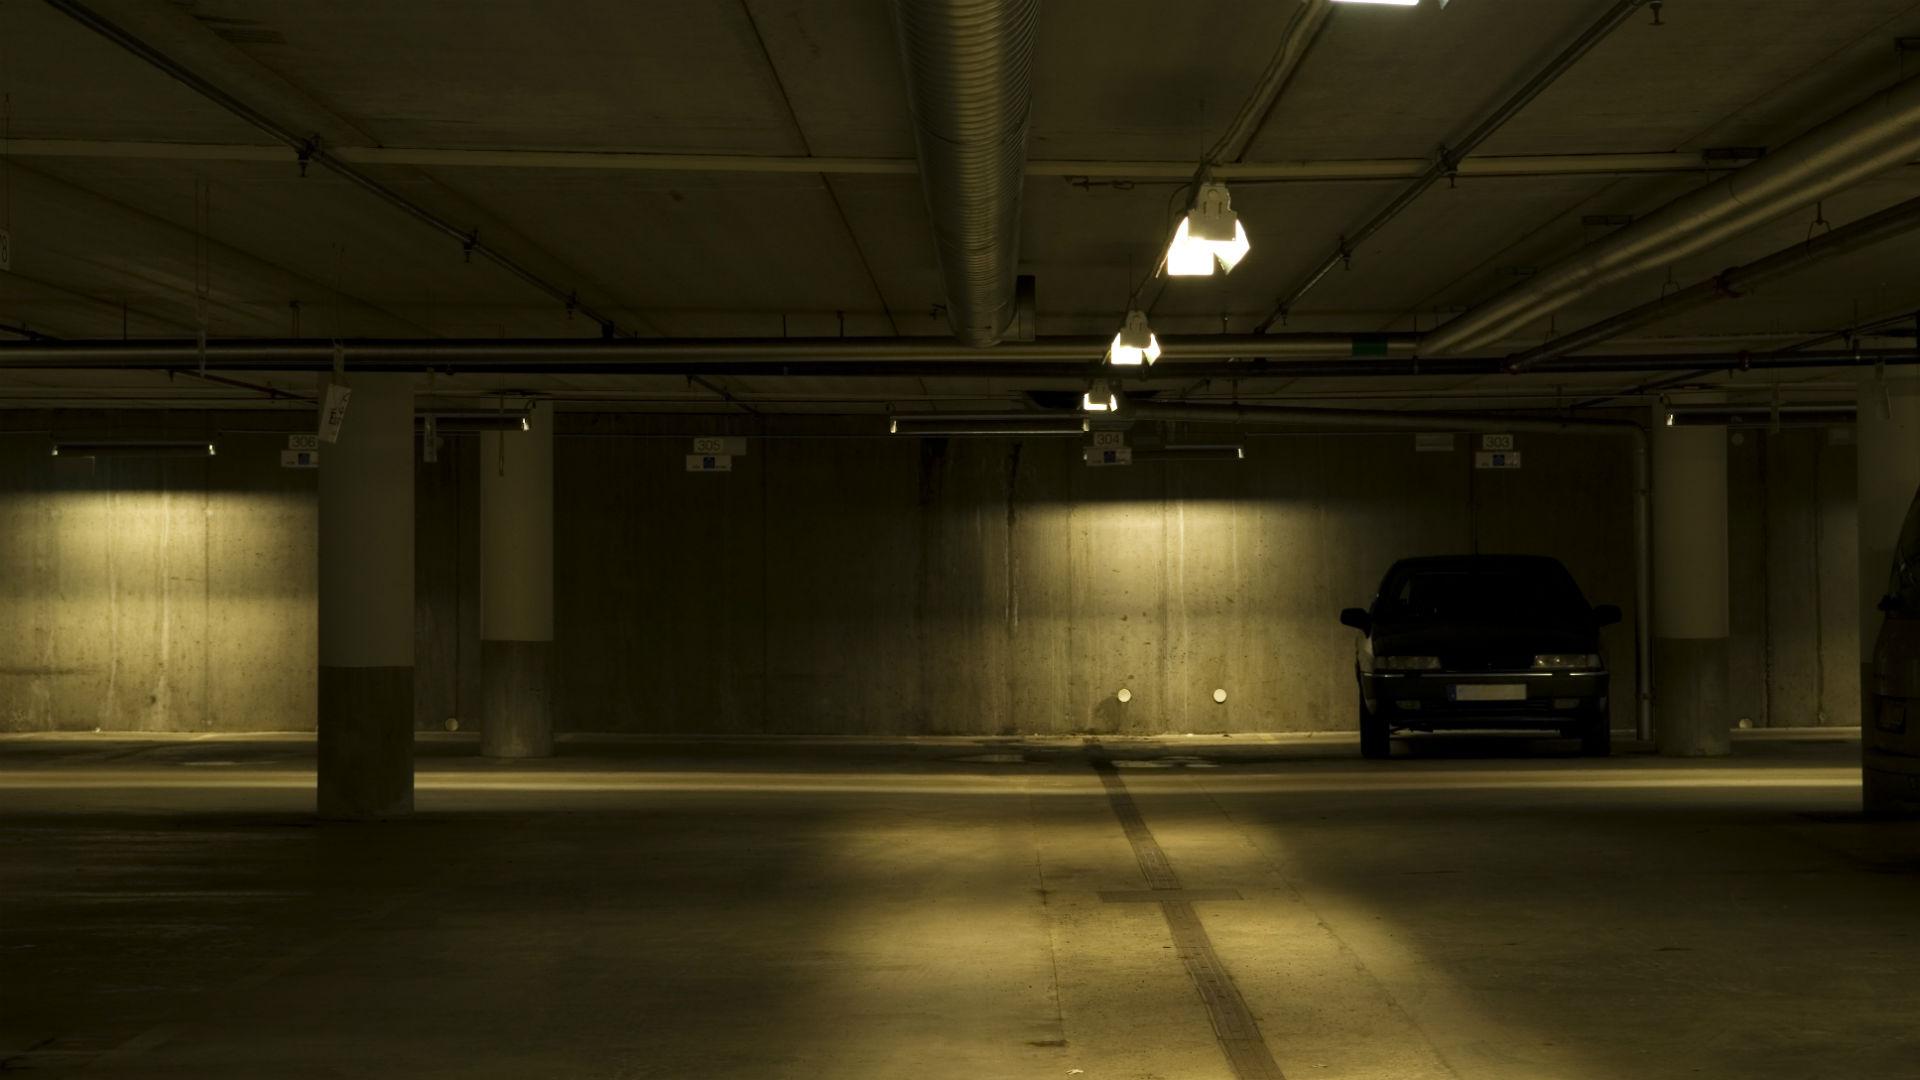 car in underground car park